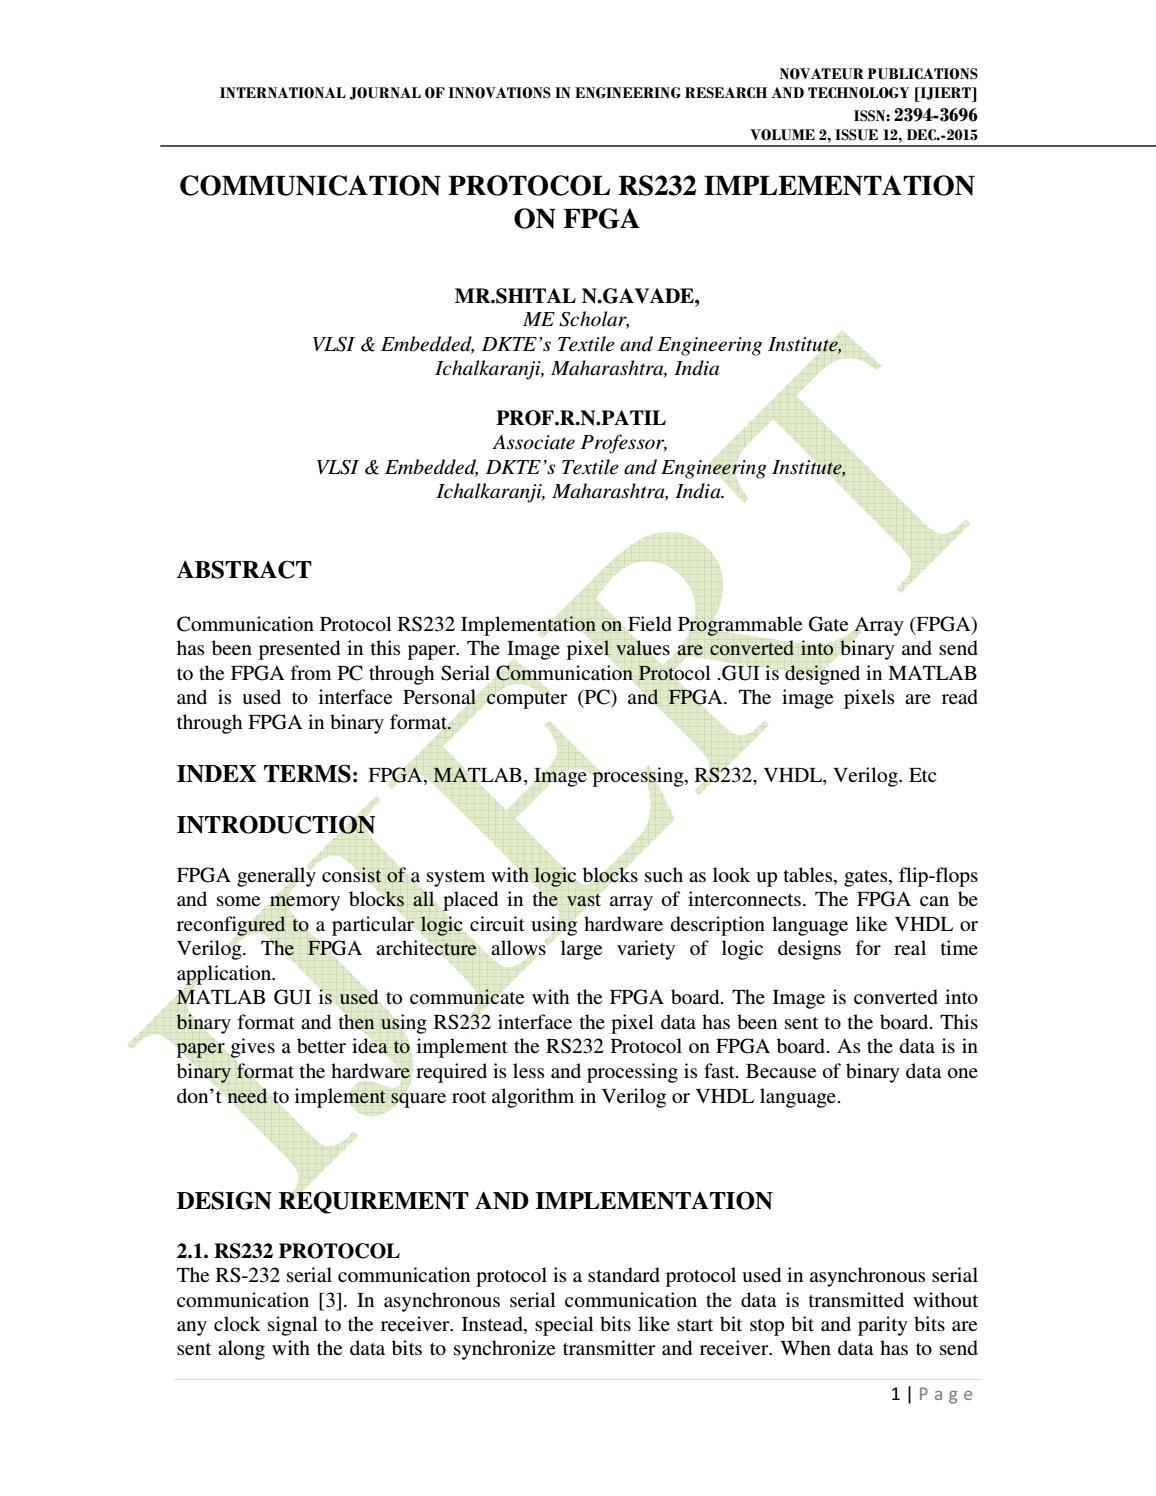 IJIERT-COMMUNICATION PROTOCOL RS232 IMPLEMENTATION ON FPGA